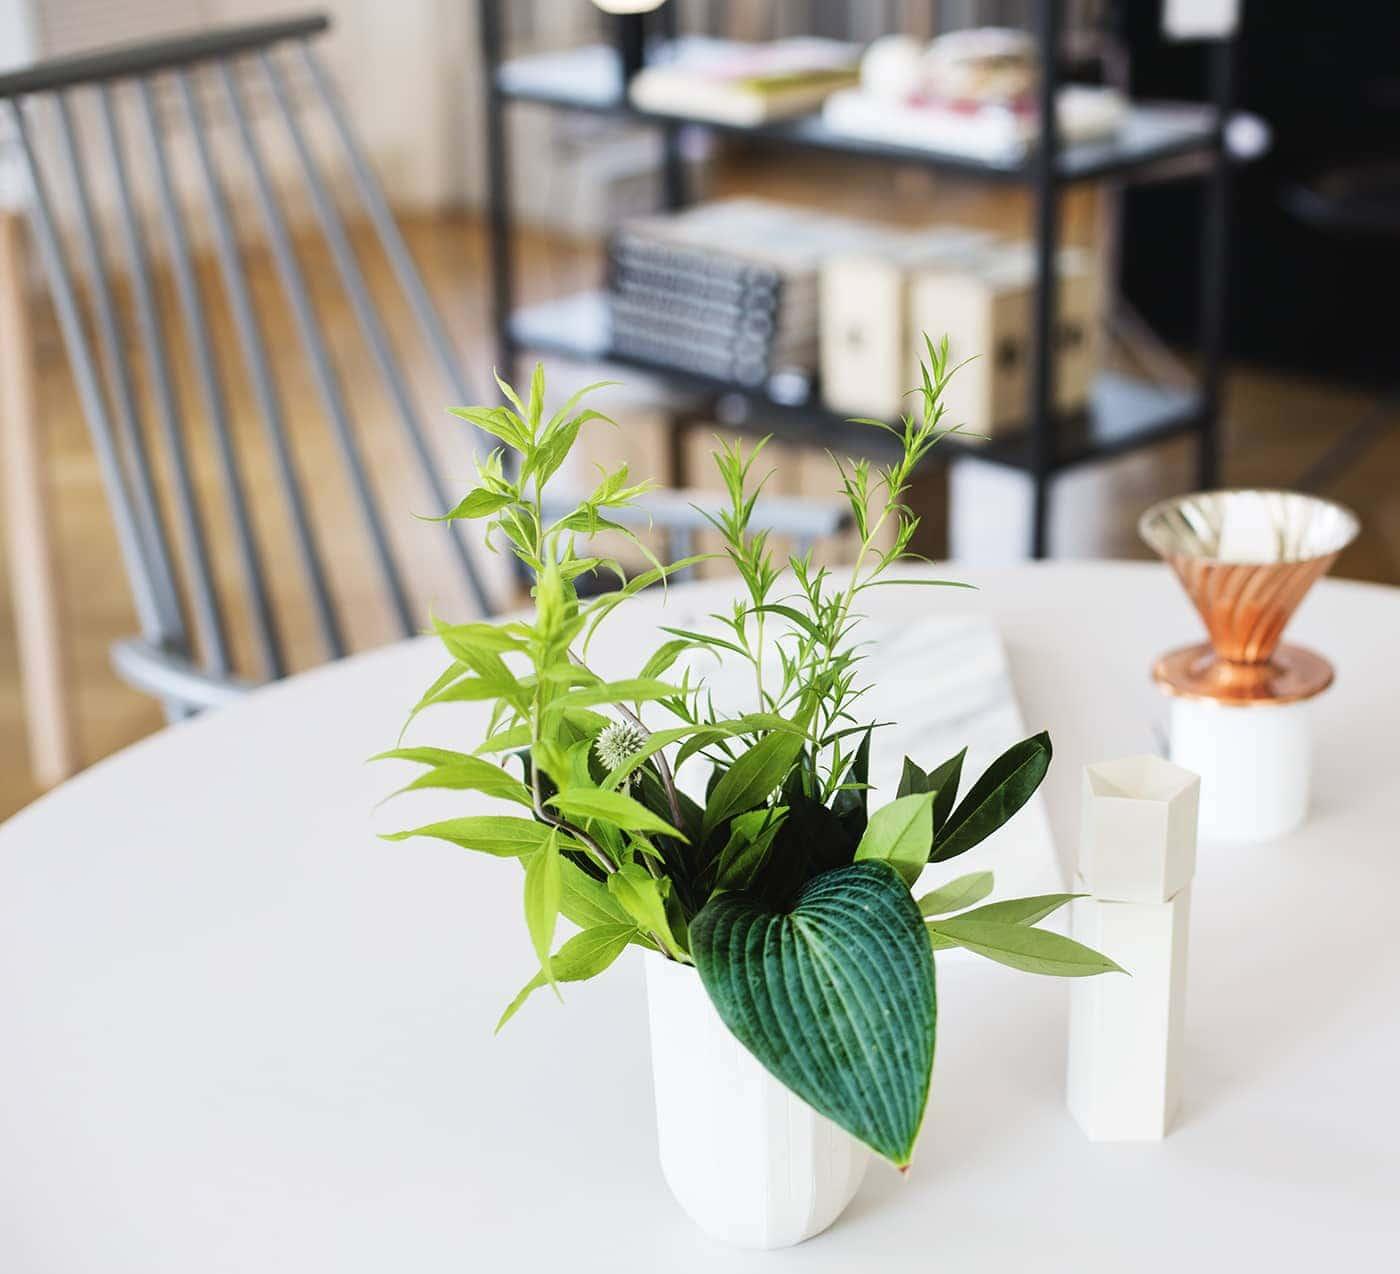 Copenhagen | wanderlust | HAY interior styling